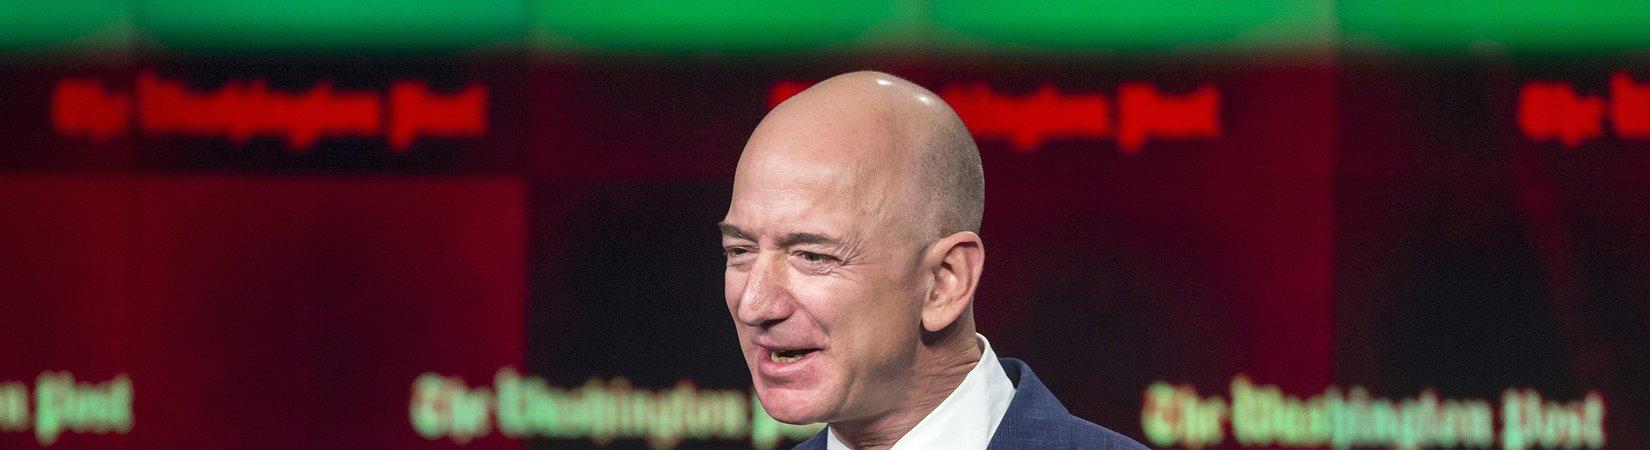 До звания самого богатого человека Джеффу Безосу не хватает $5 млрд